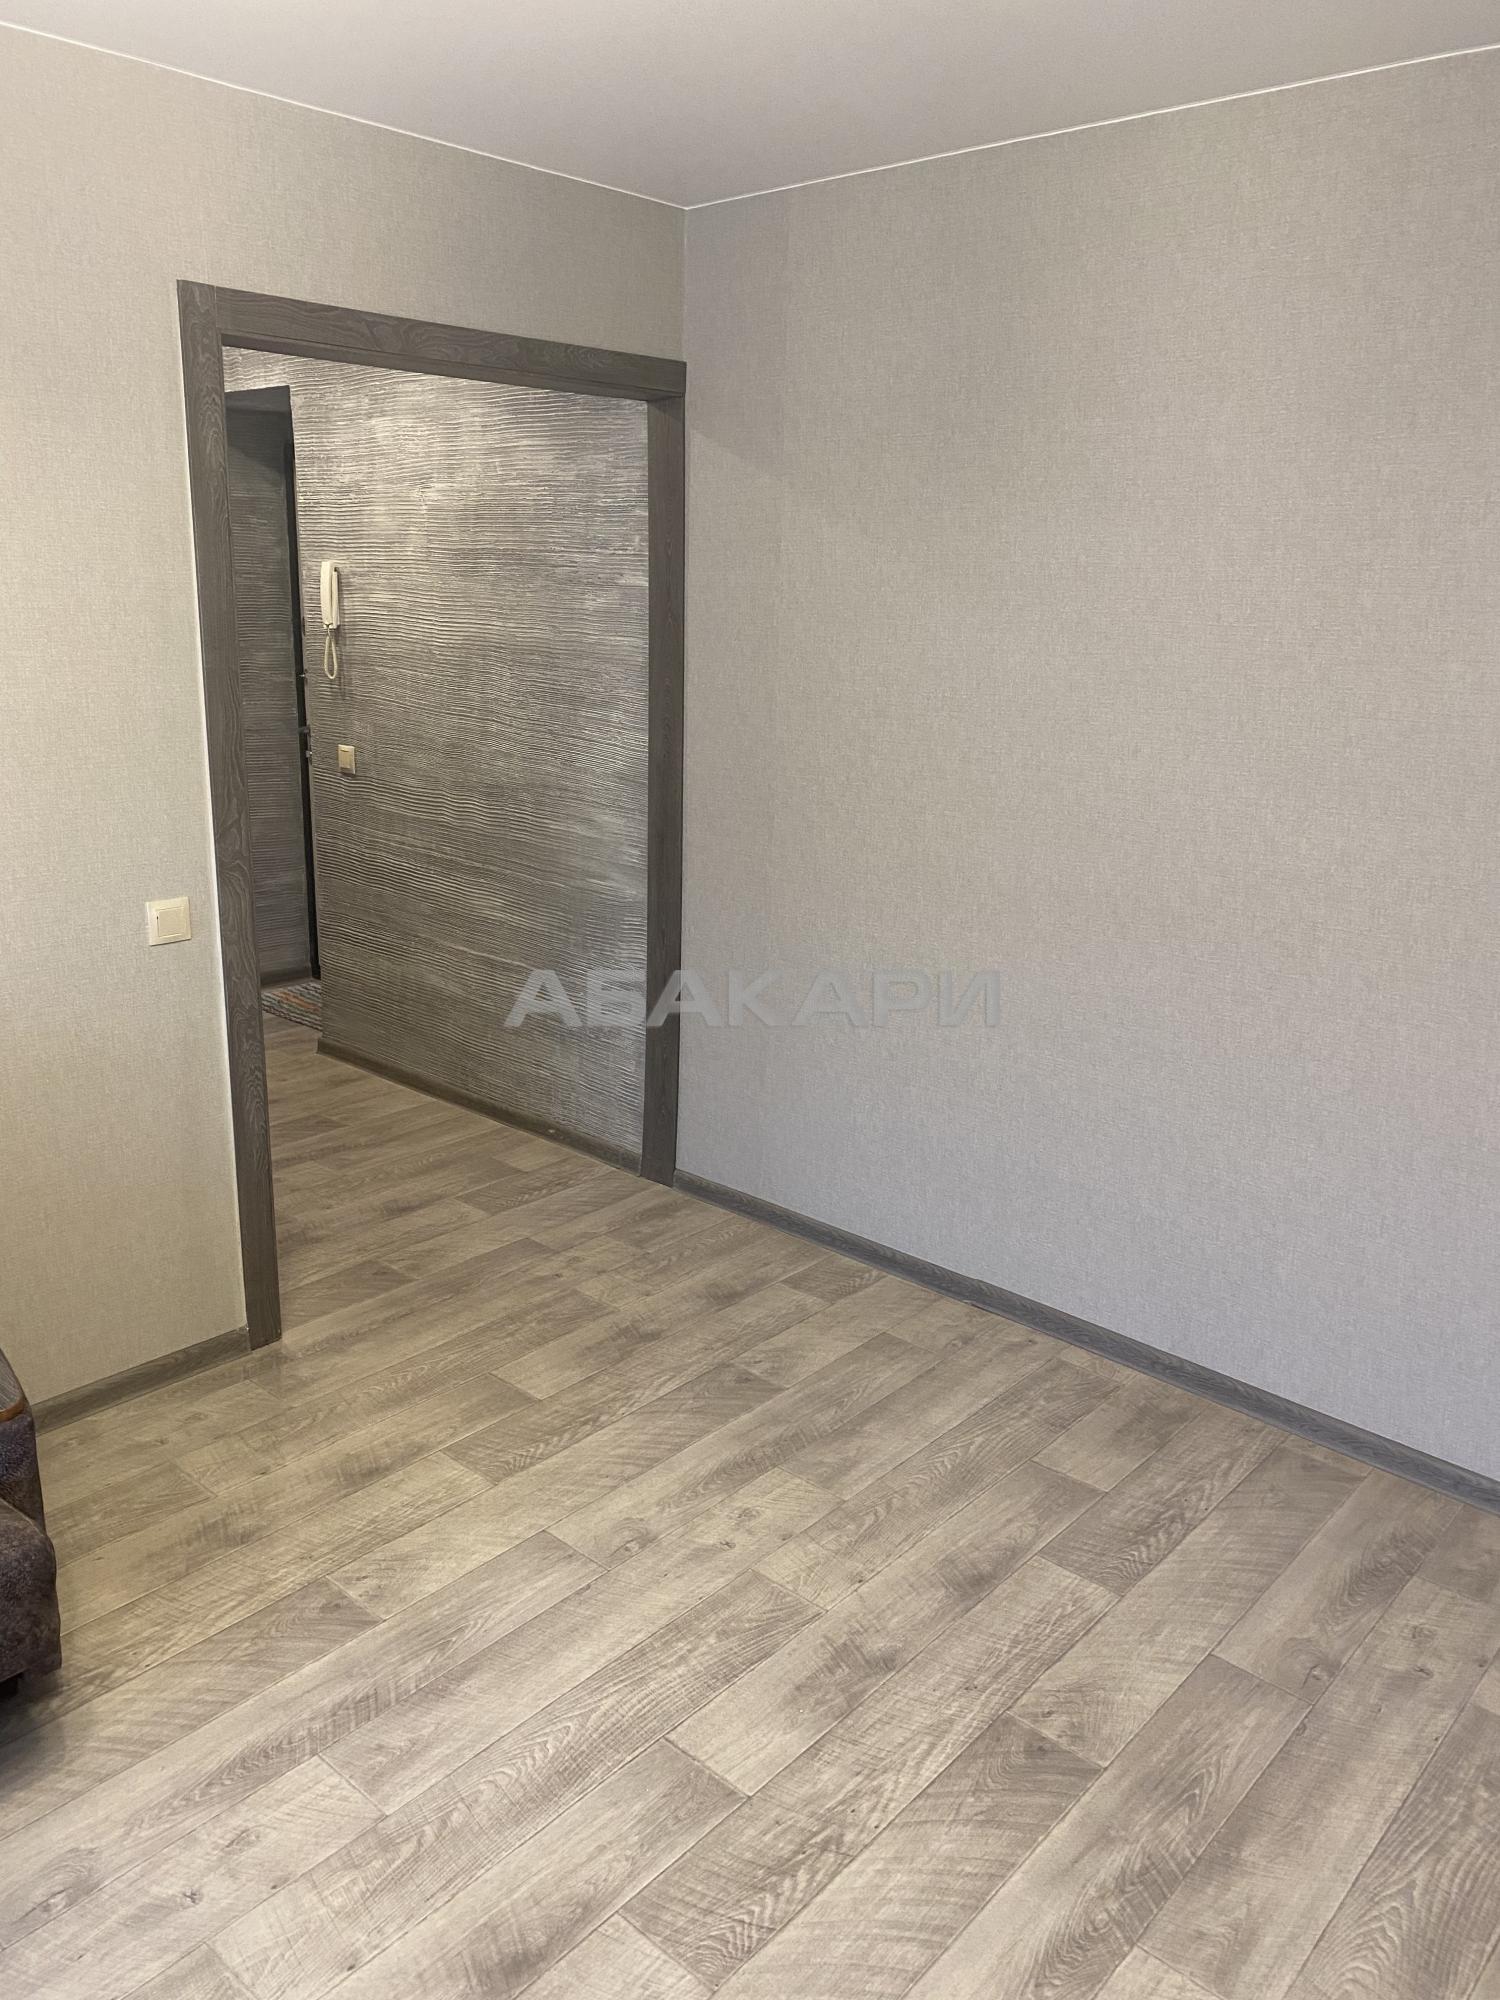 2к квартира улица Мирошниченко, 1 4/9 - 47кв   25000   аренда в Красноярске фото 2